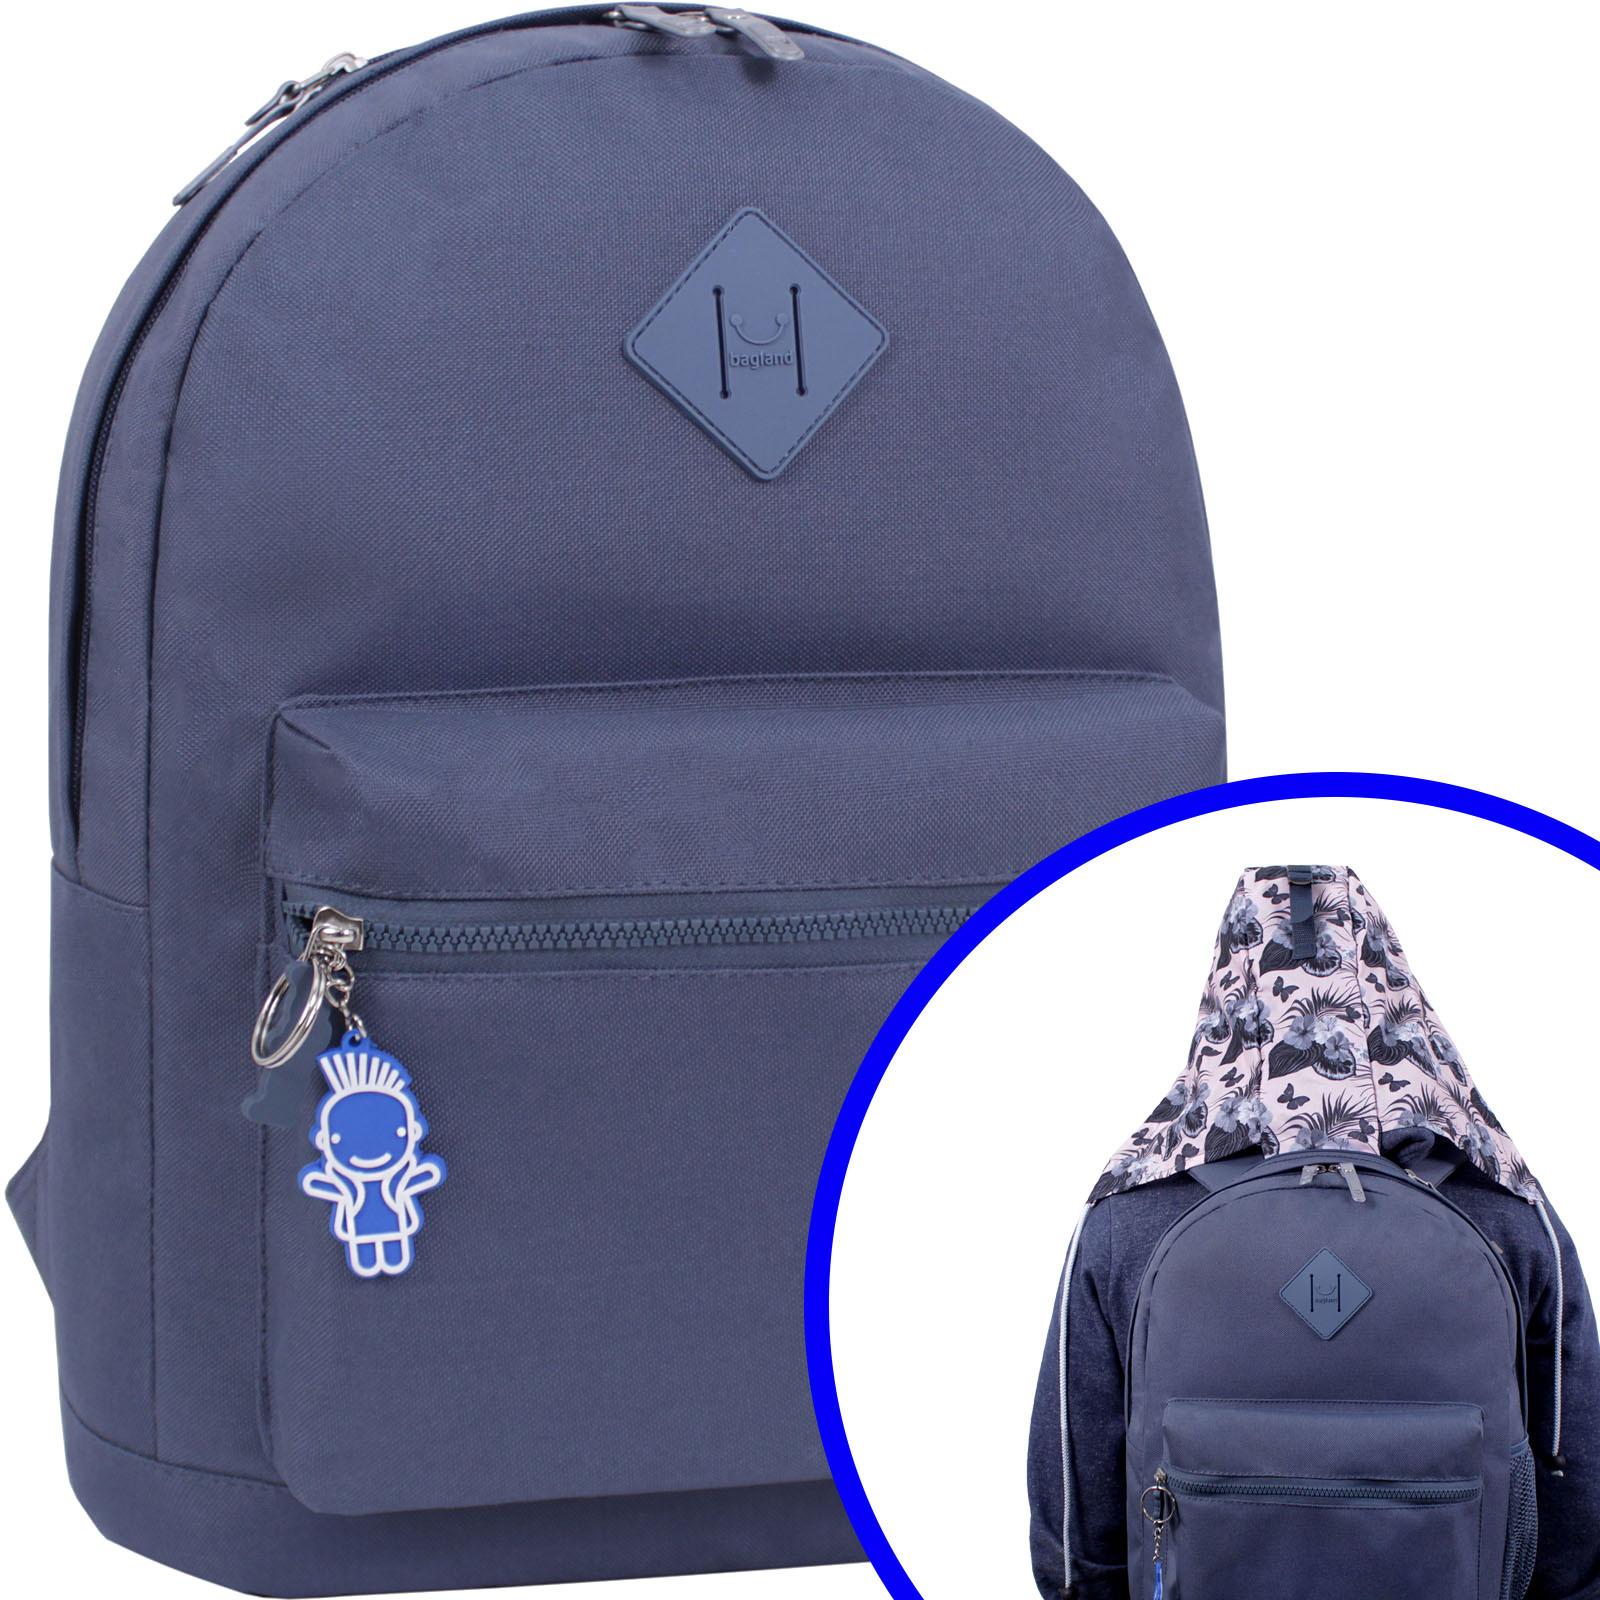 Городские рюкзаки Рюкзак Bagland Hood W/R 17 л. серый 458 (0054466) Вариант_4.jpg